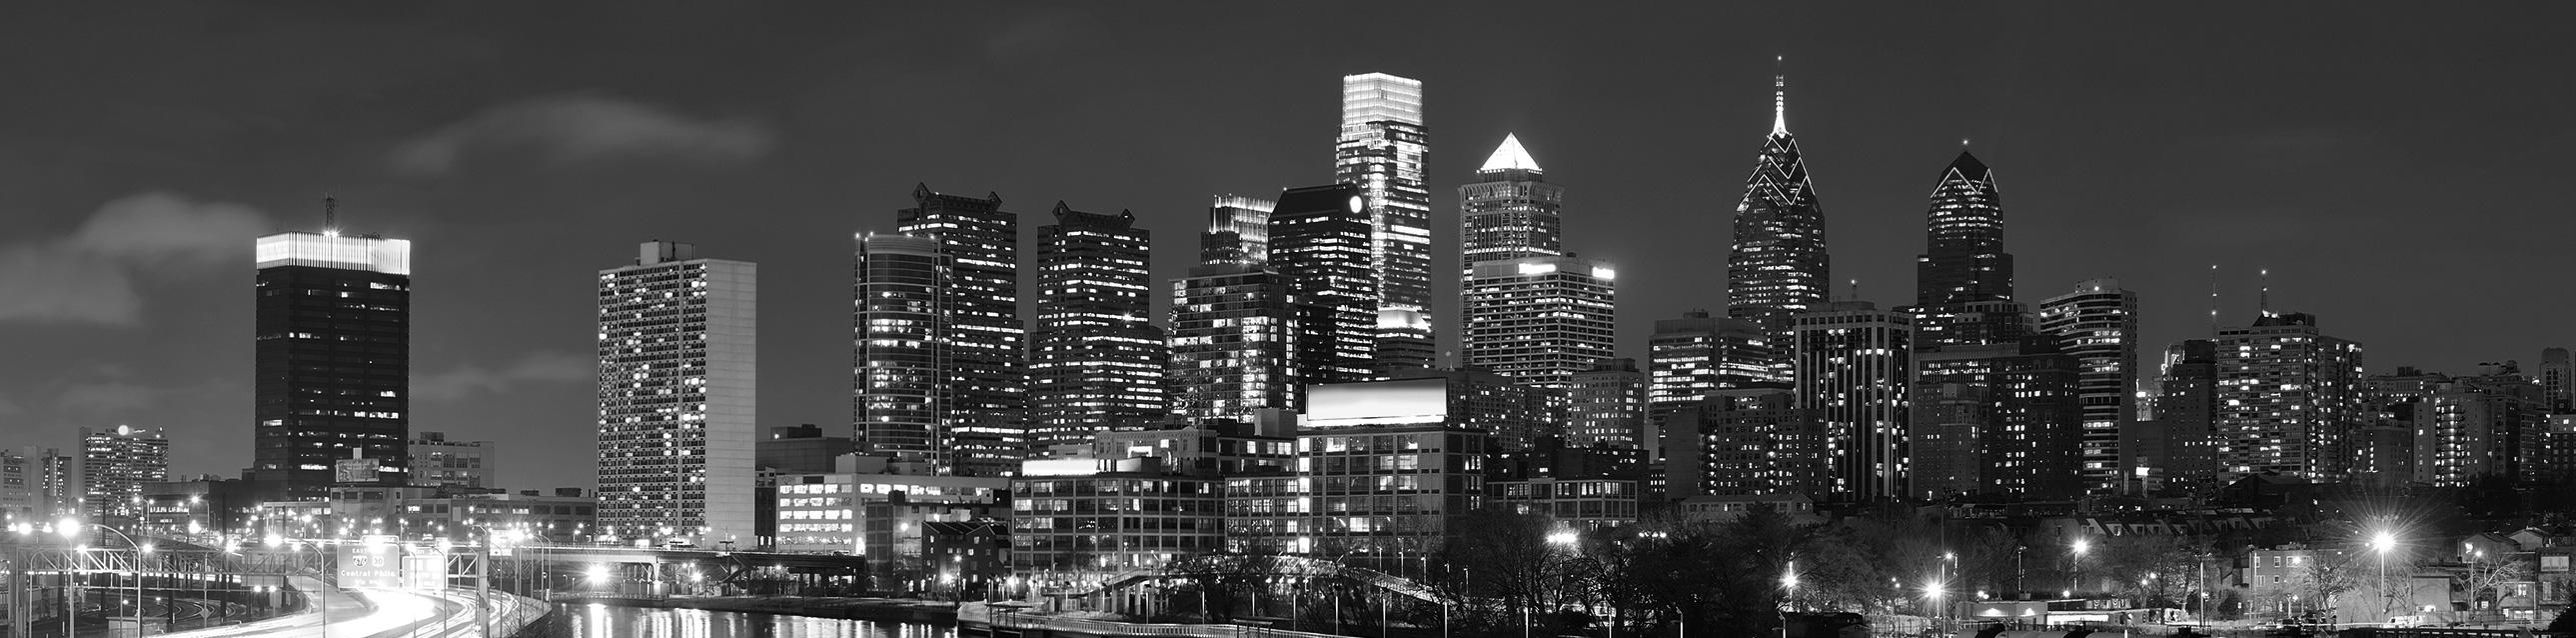 Philadelphia-skyline-at-night